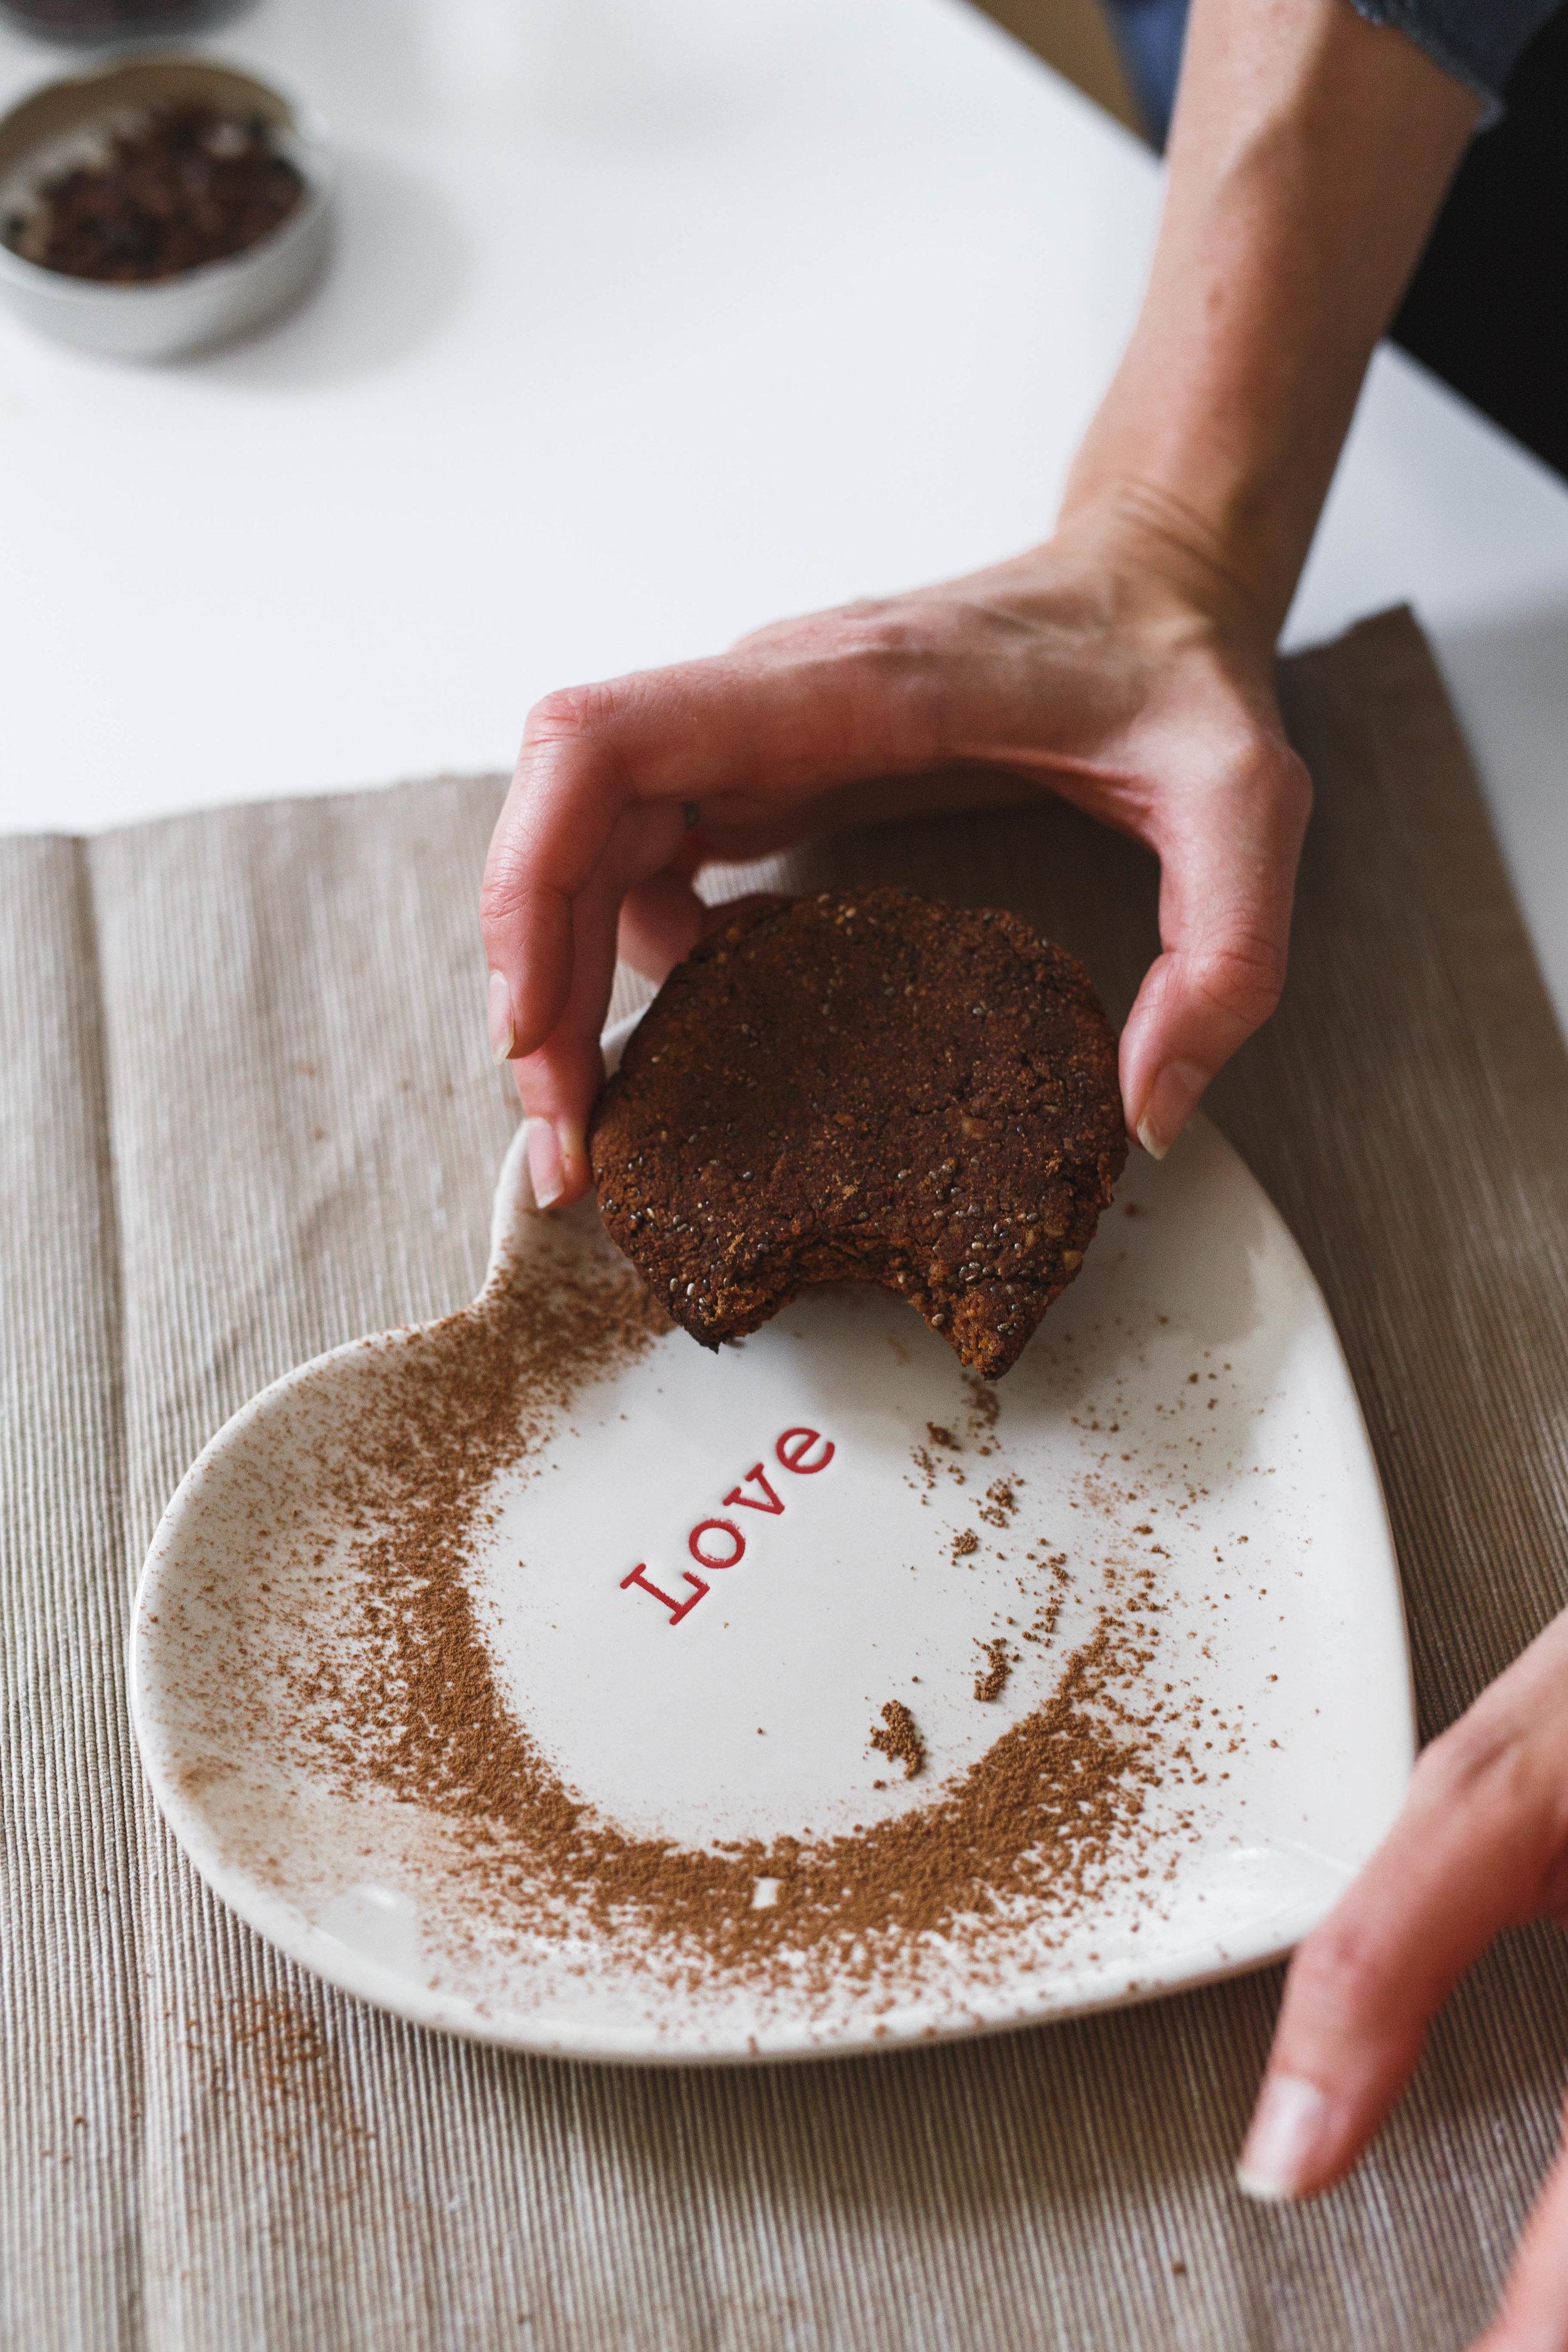 Holly White, Vegan Dublin, Chocolate Vegan Cookies